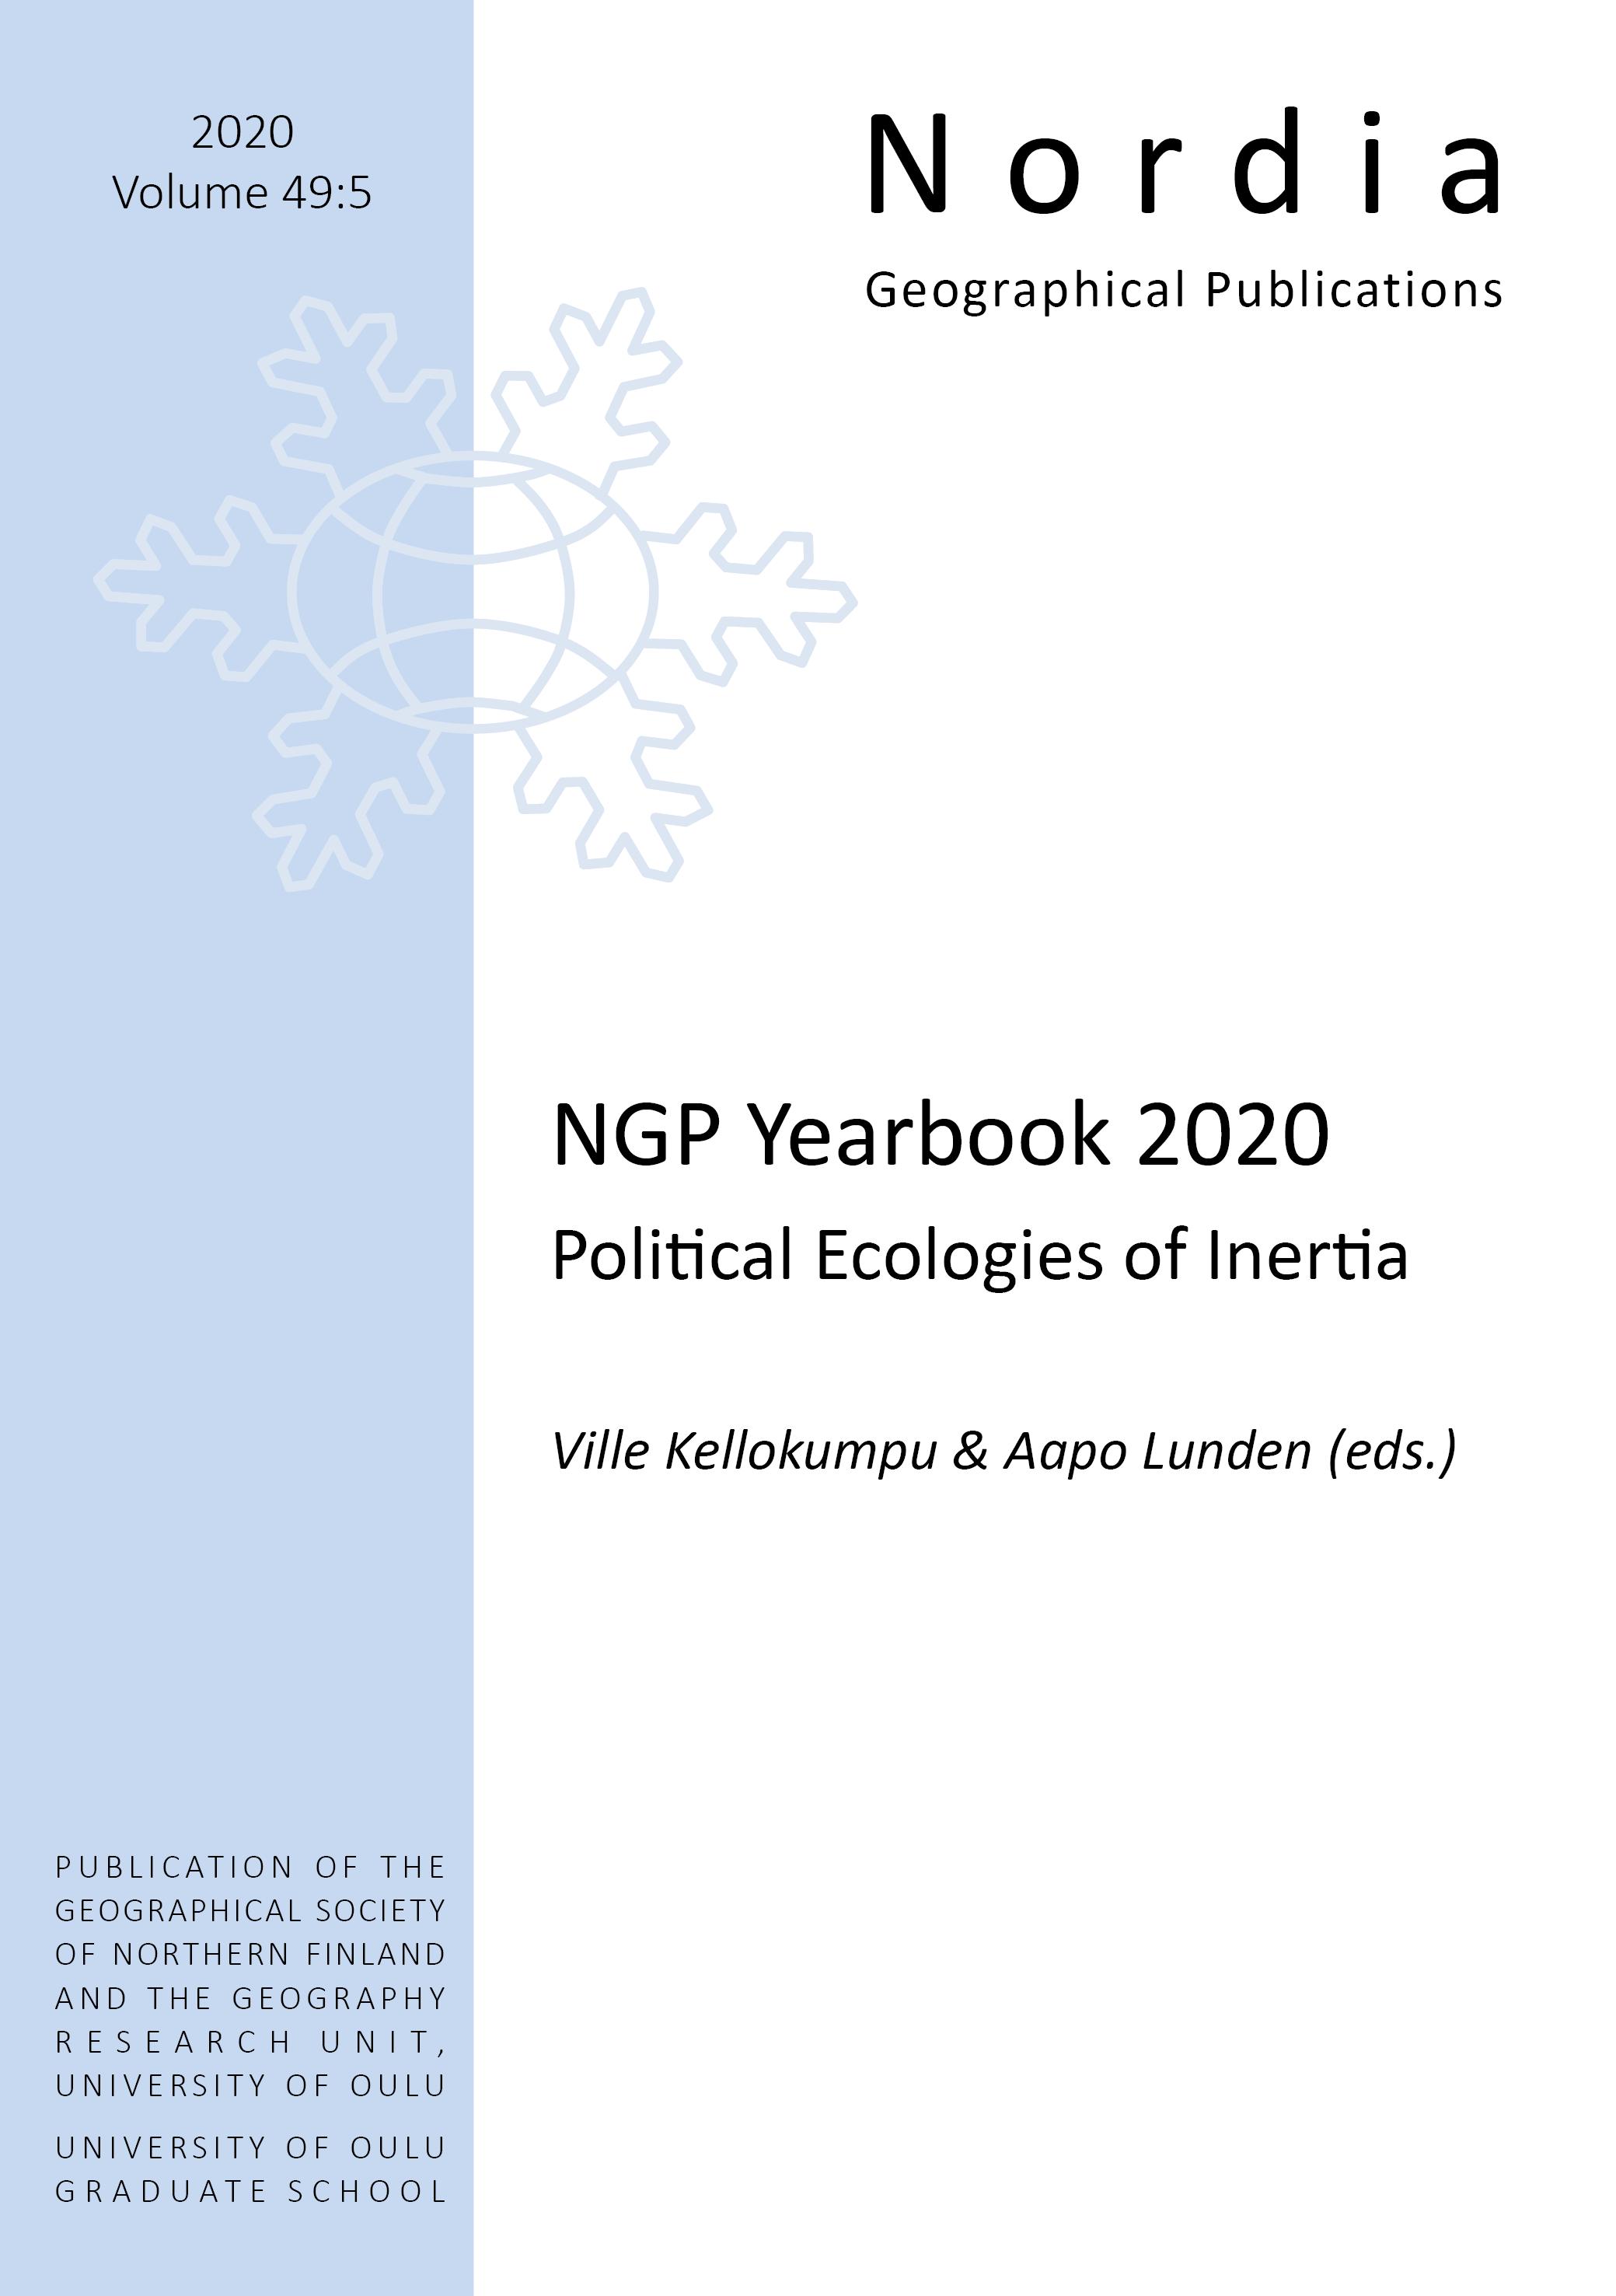 View Vol. 49 No. 5 (2020): NGP Yearbook 2020 Political Ecologies of Inertia